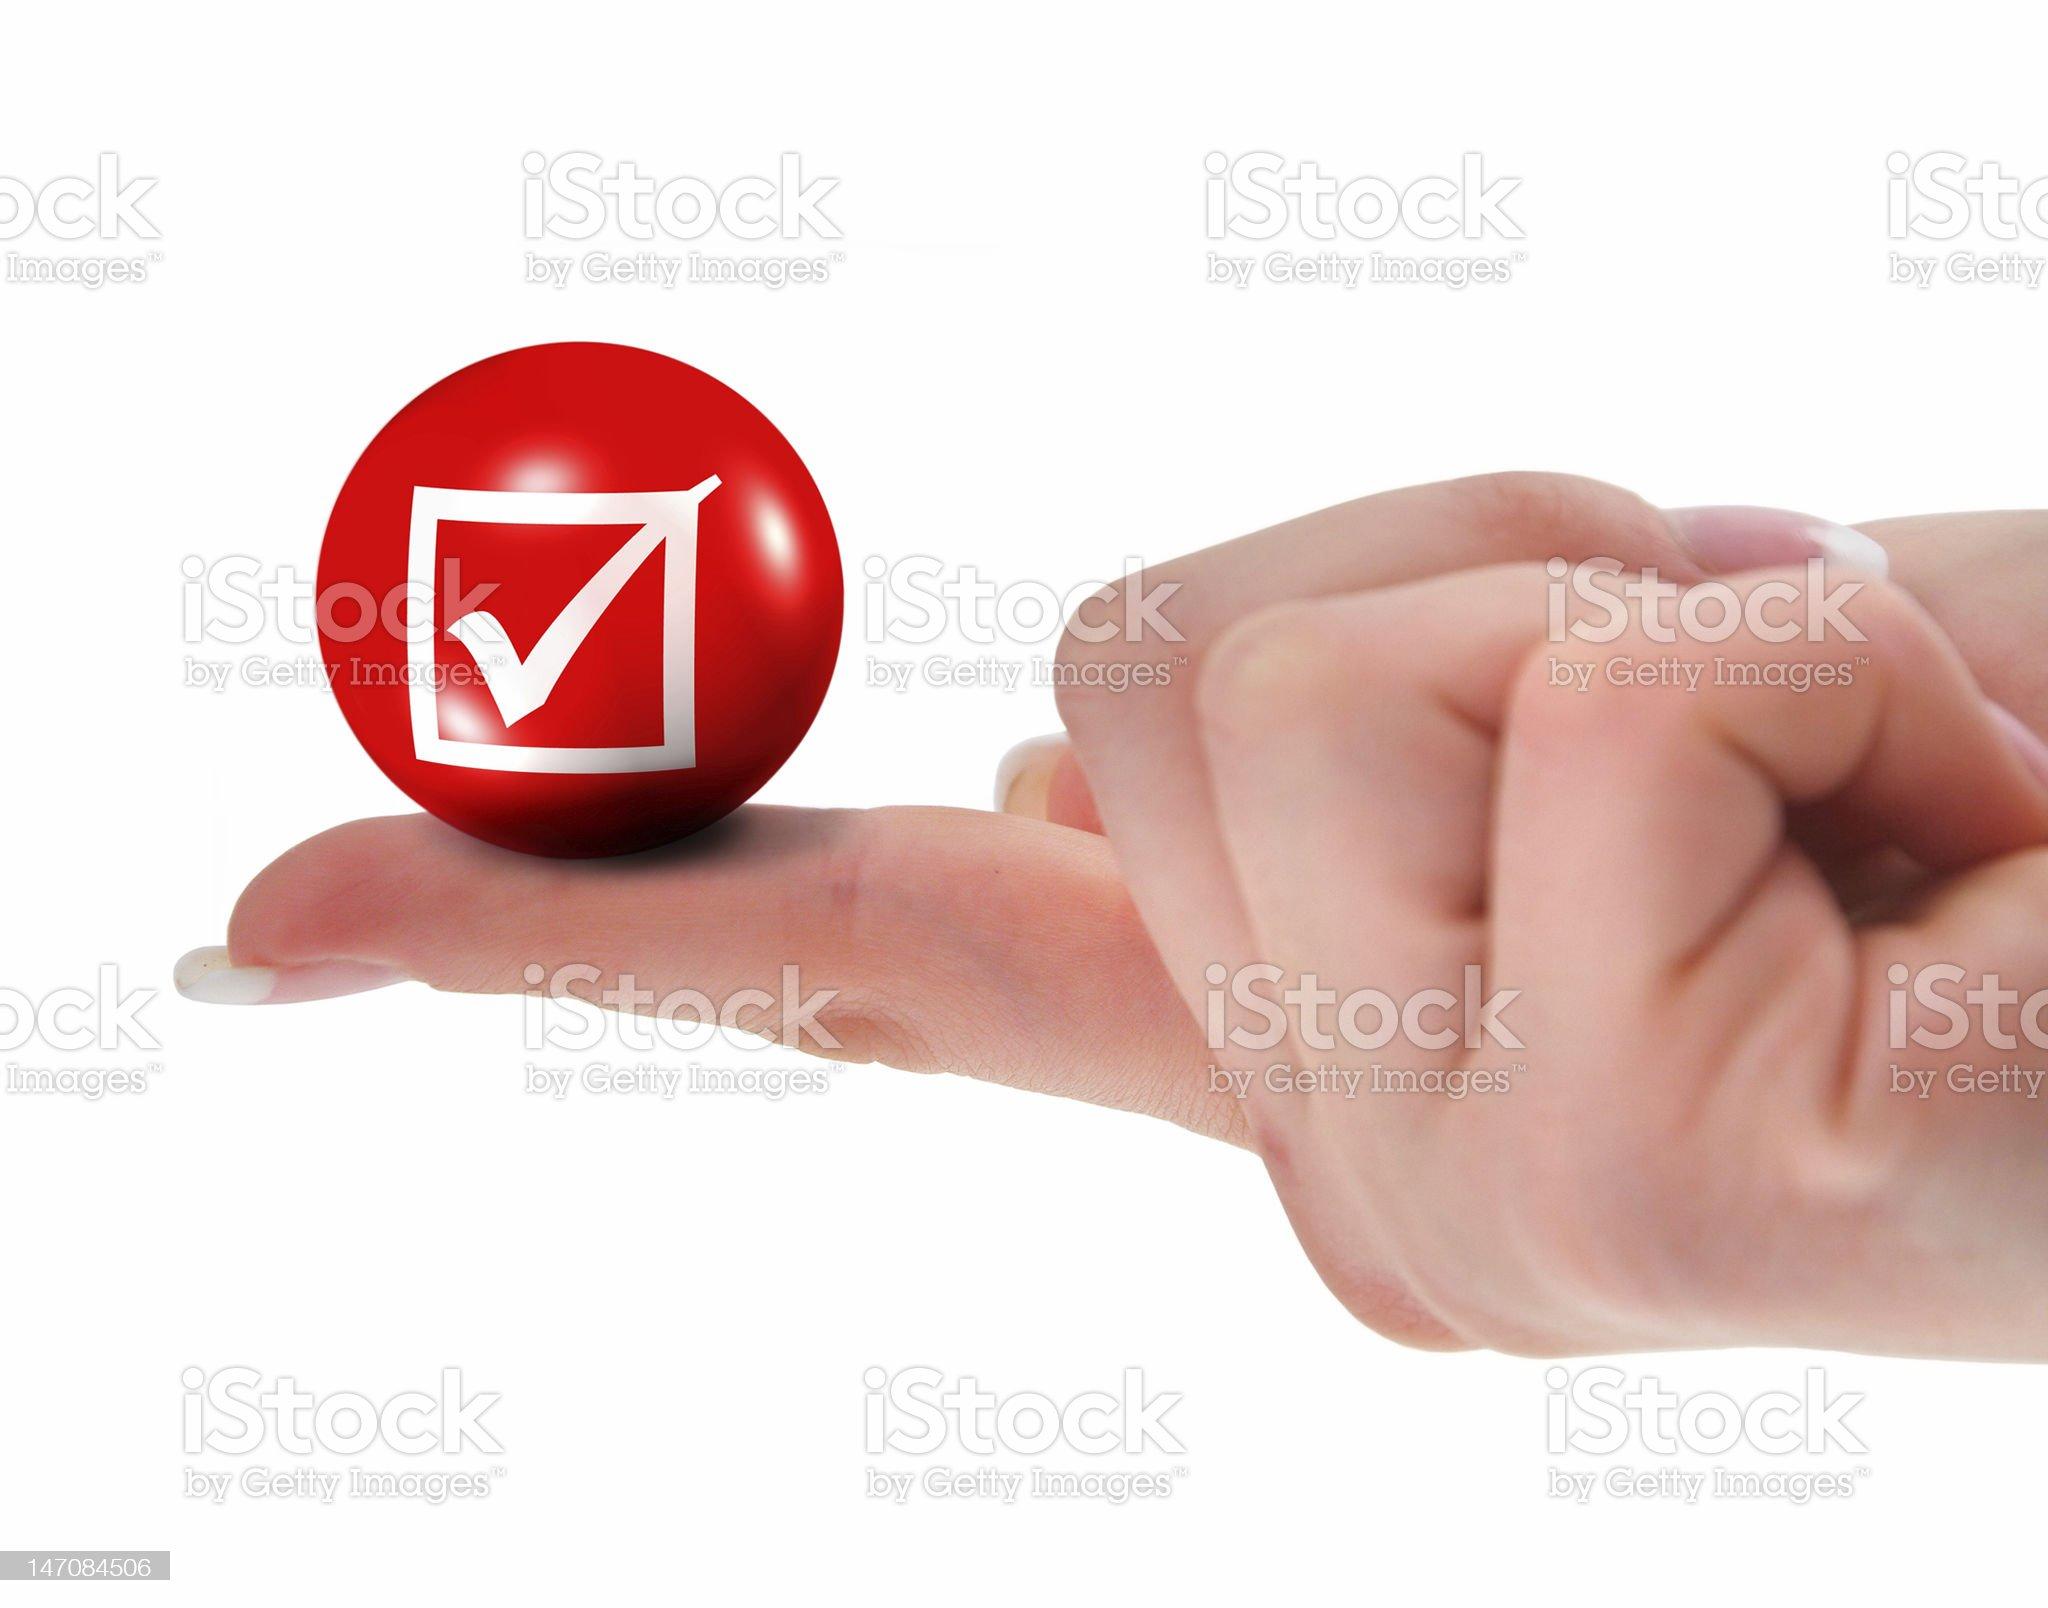 tick sign on finger shallow DOF royalty-free stock photo